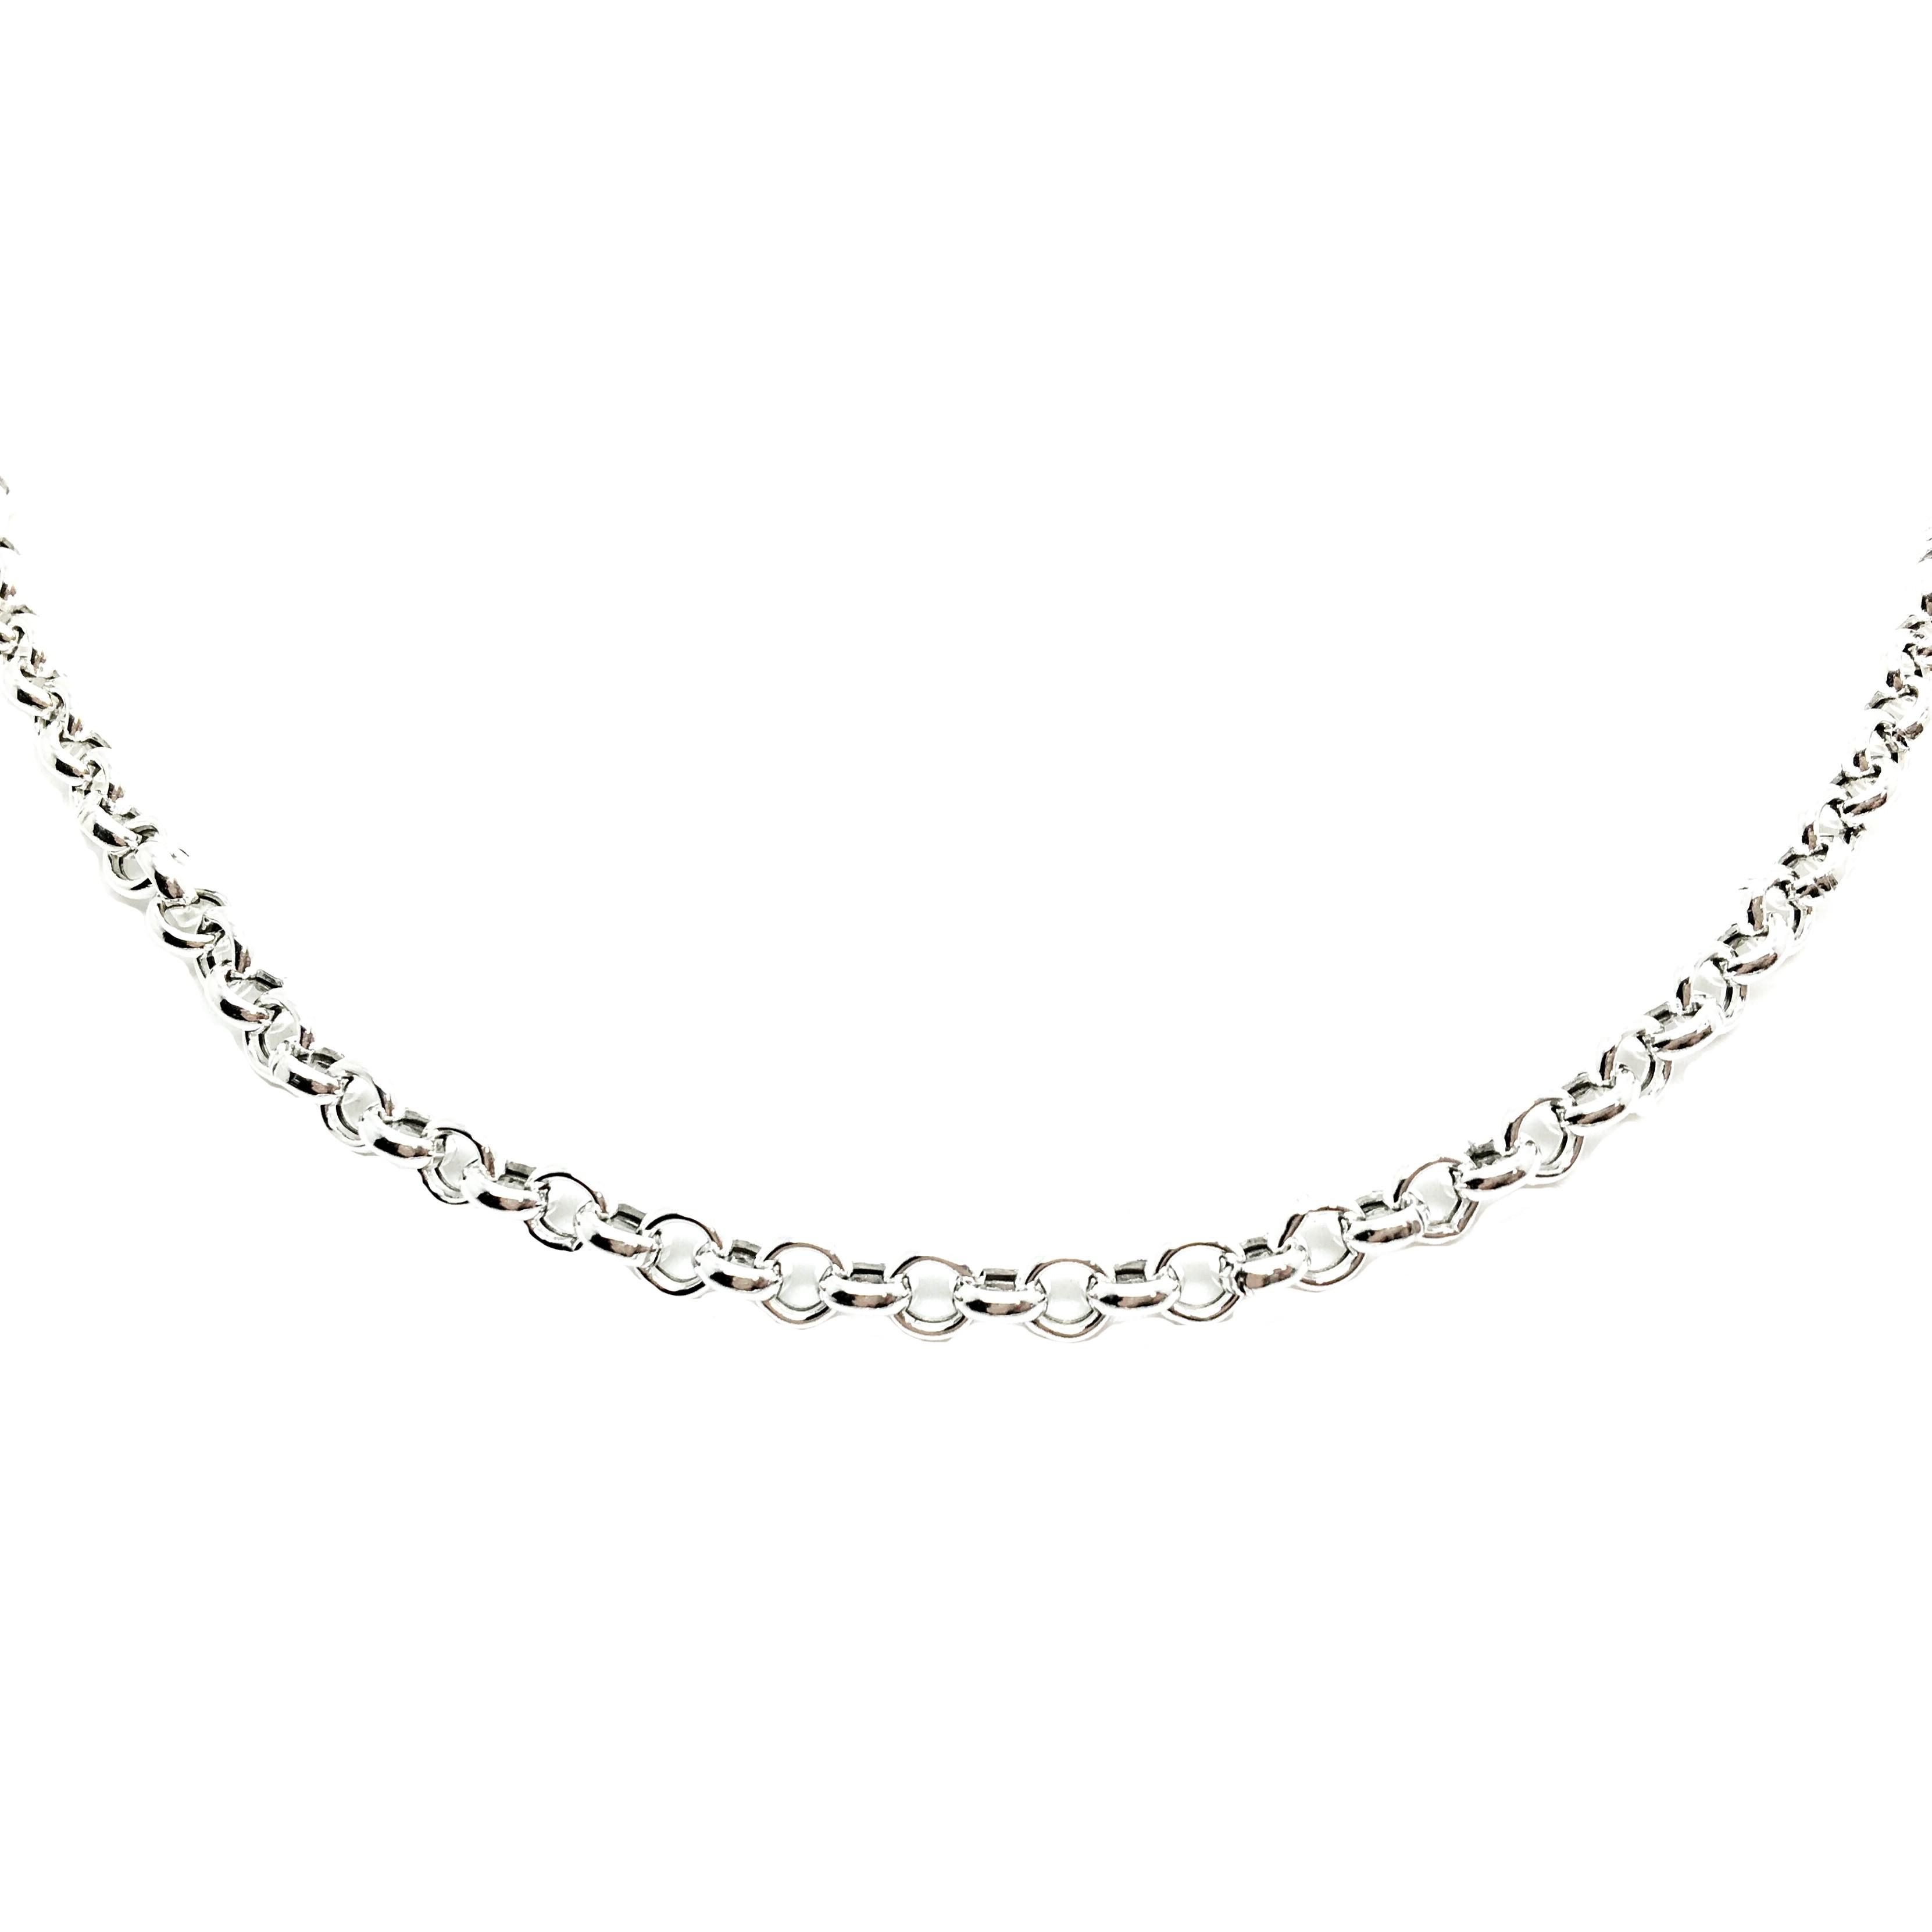 792c5f313467 Cadena plata 40cm joyería juan luis larráyoz pamplona comprar online